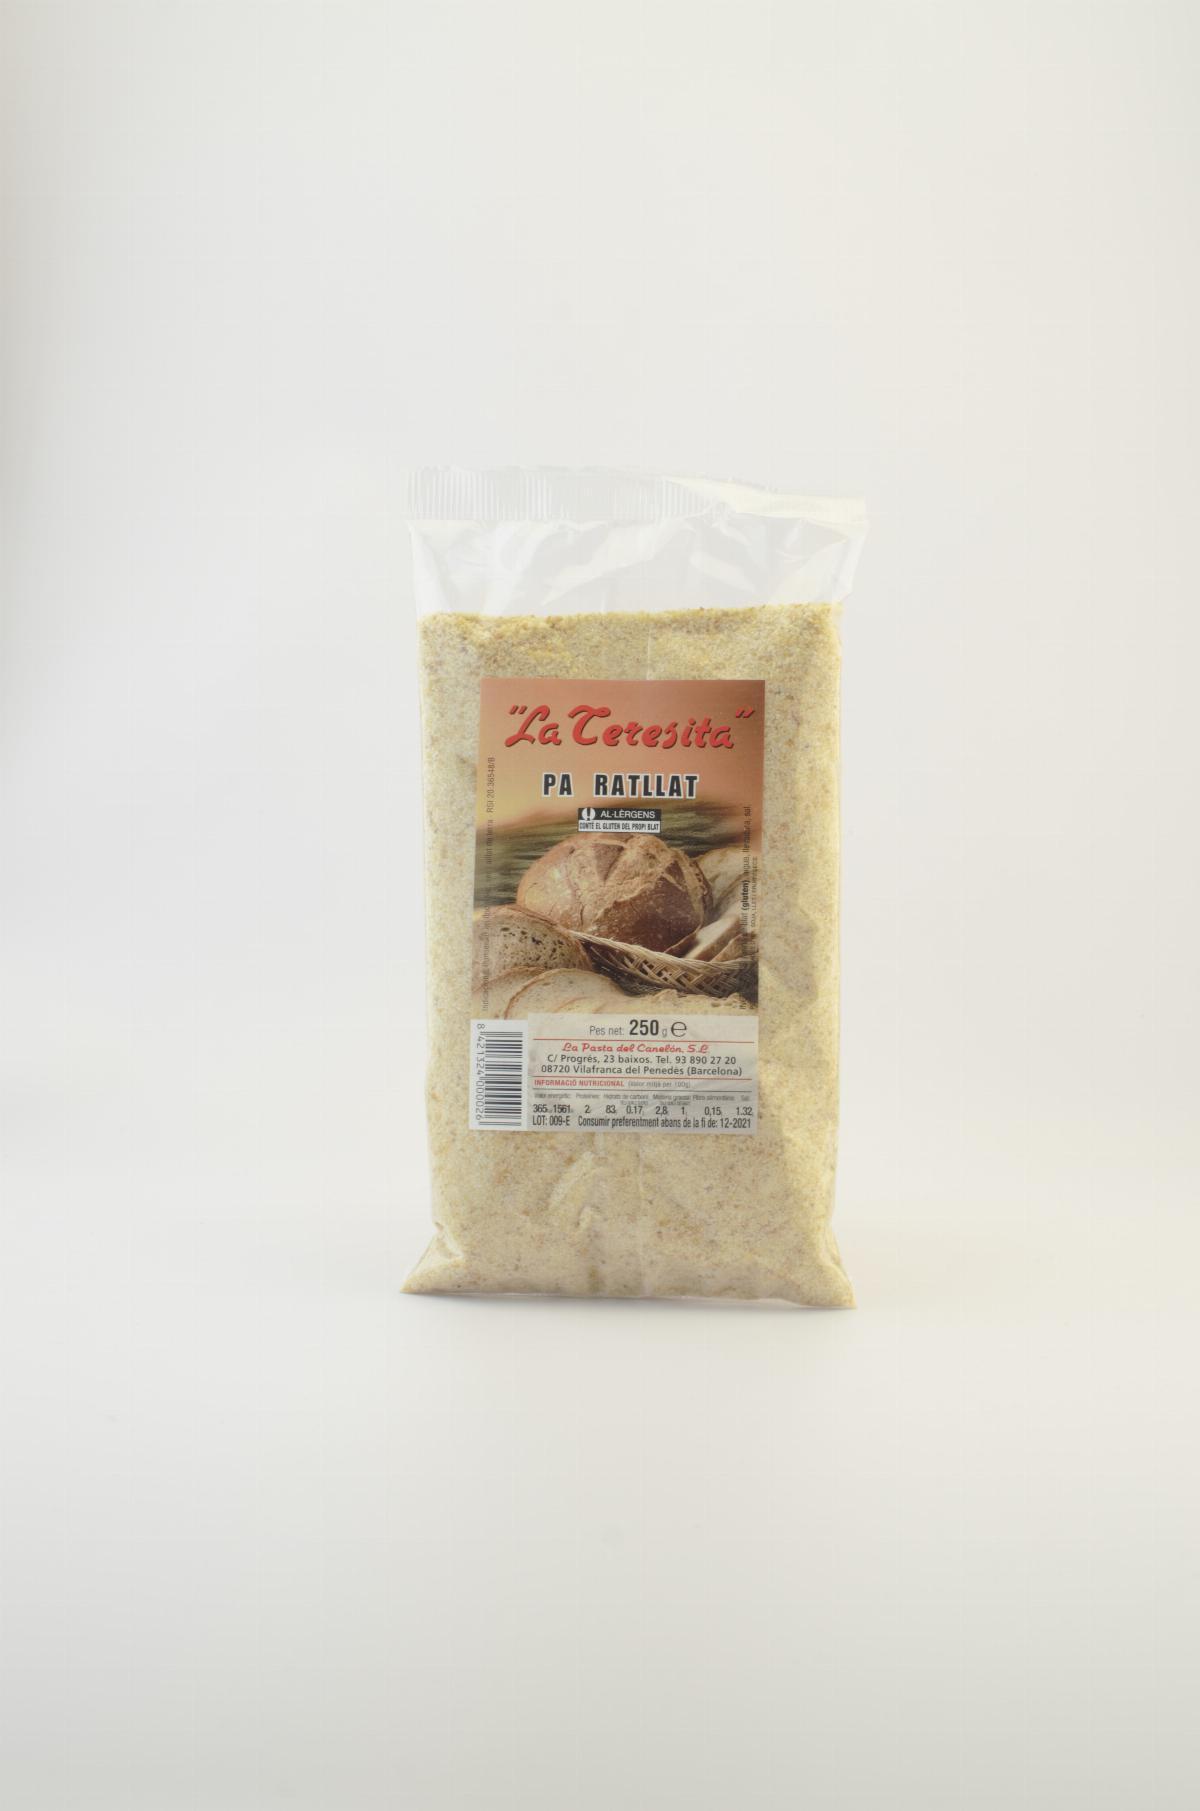 Pa Ratllat La Teresita 250 grams